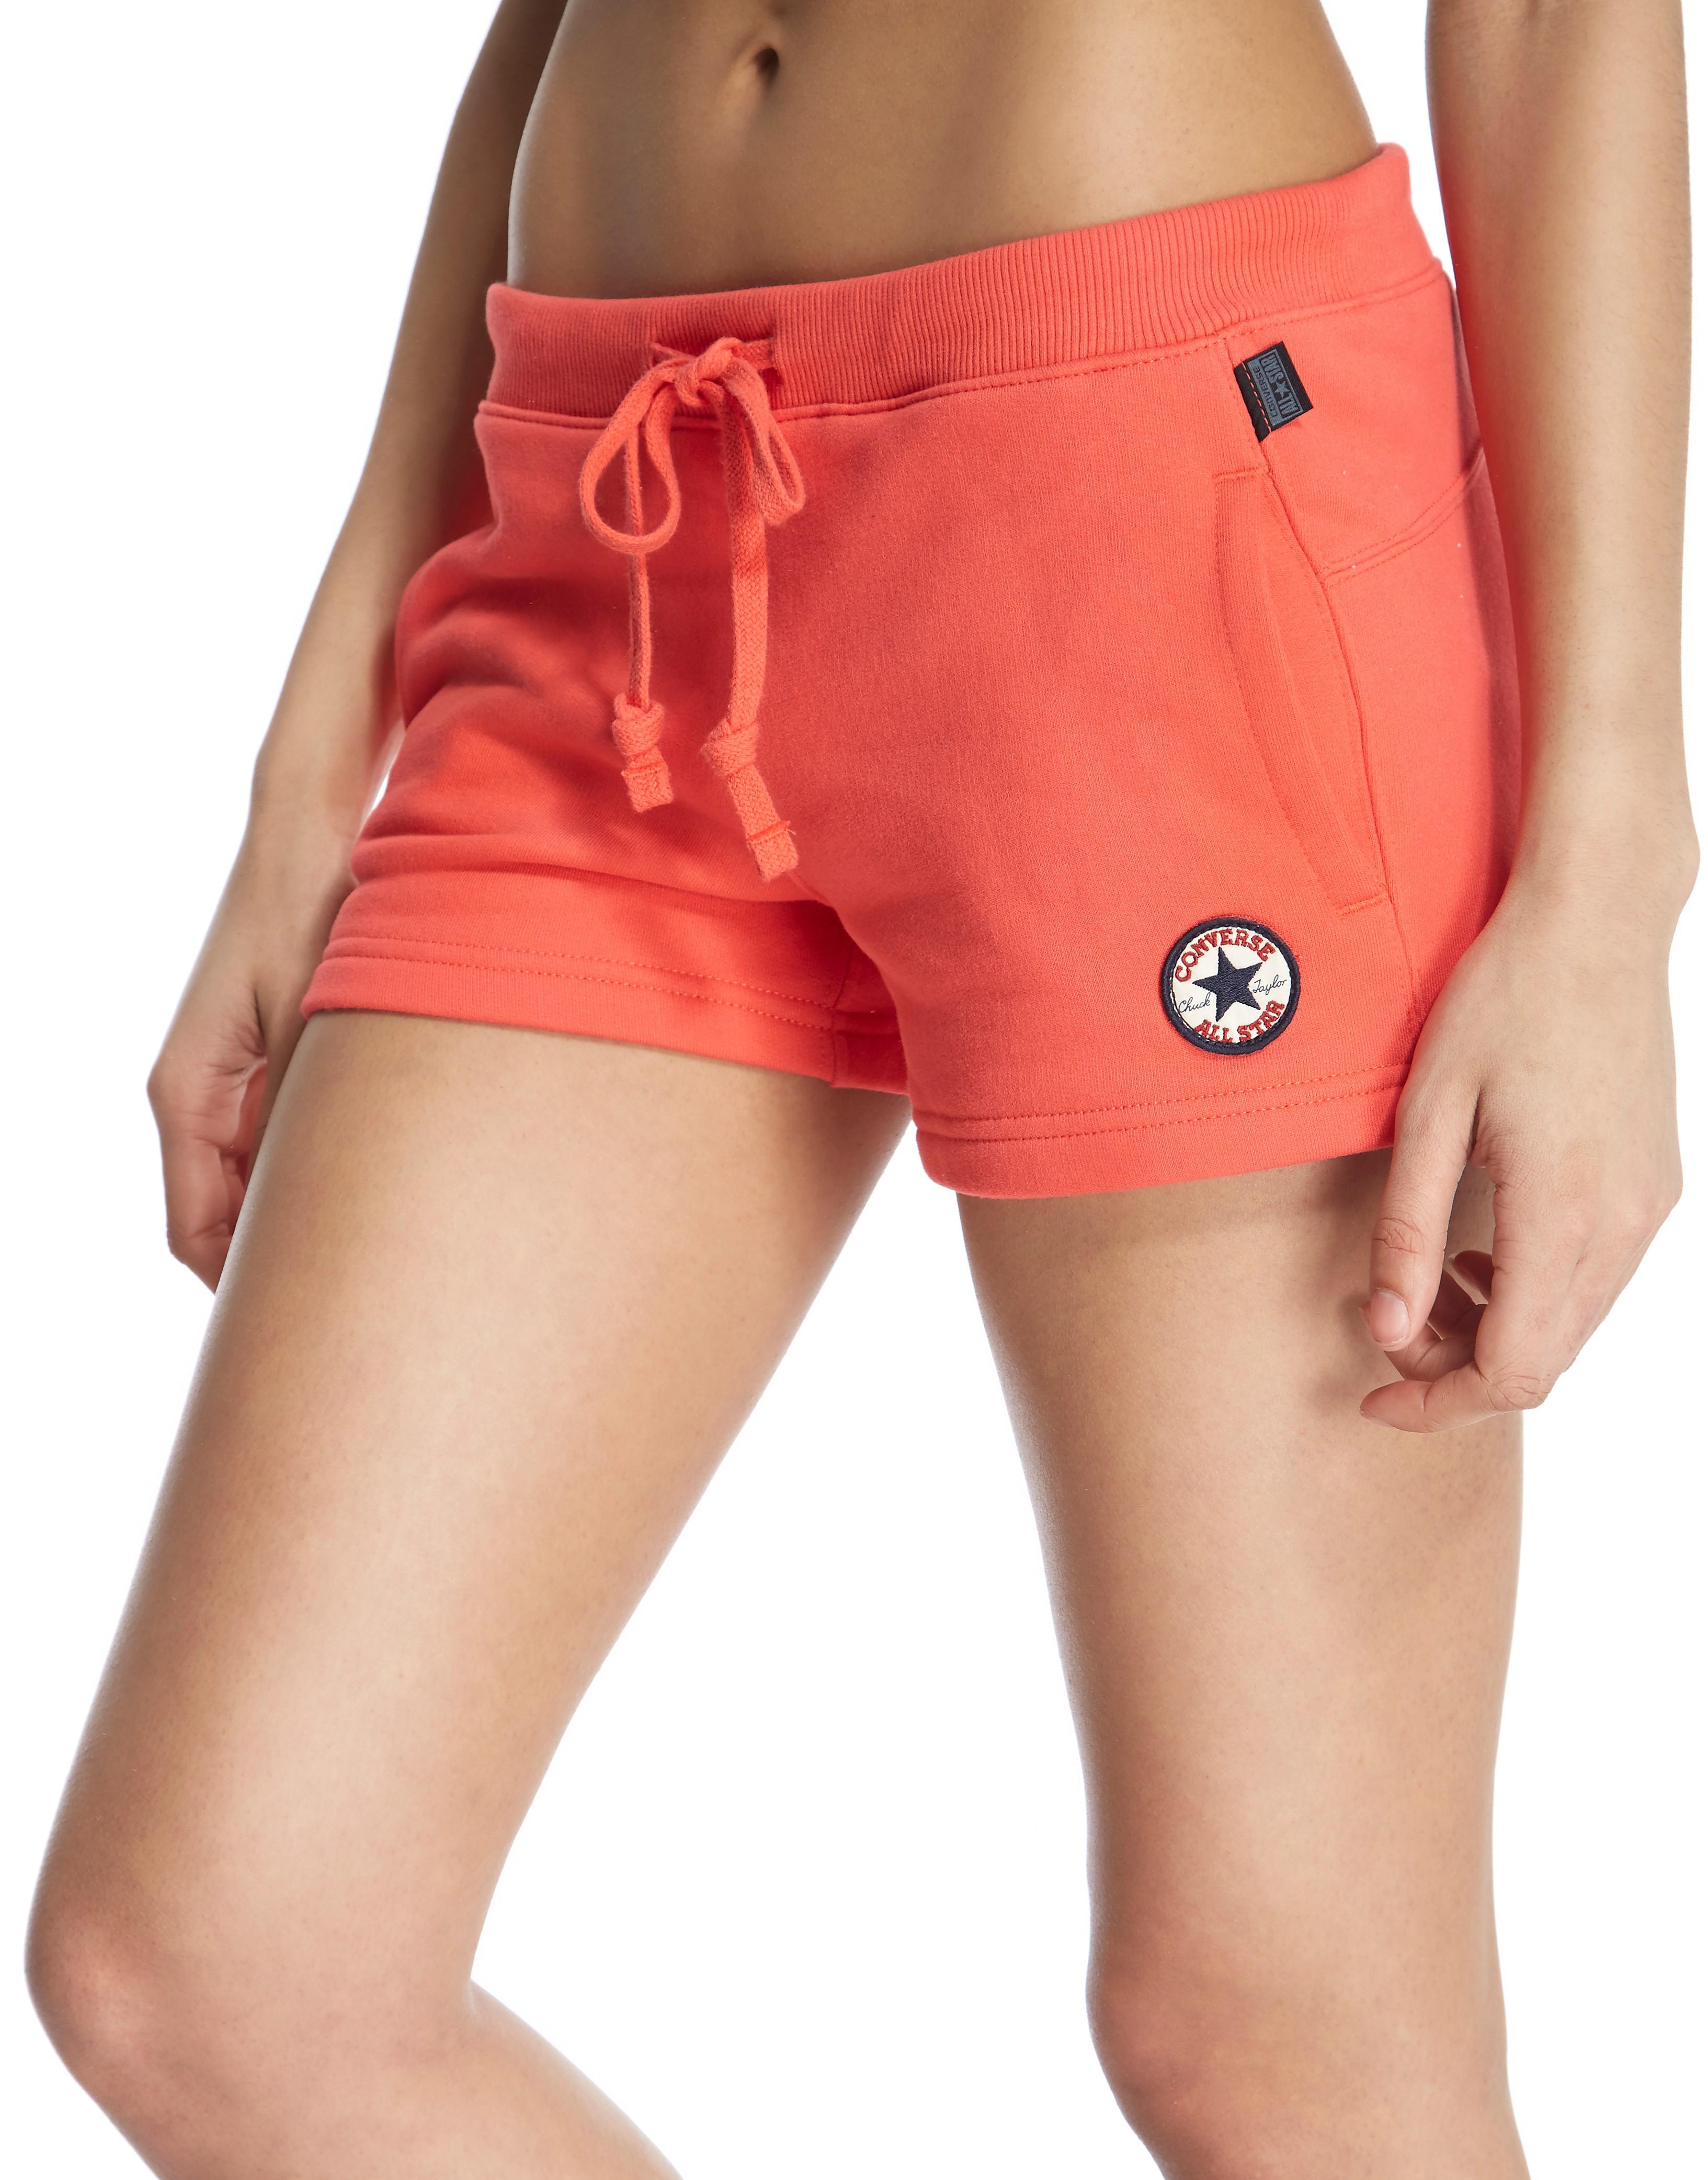 Converse Chuck Patch Shorts - Blush - Womens, Blush